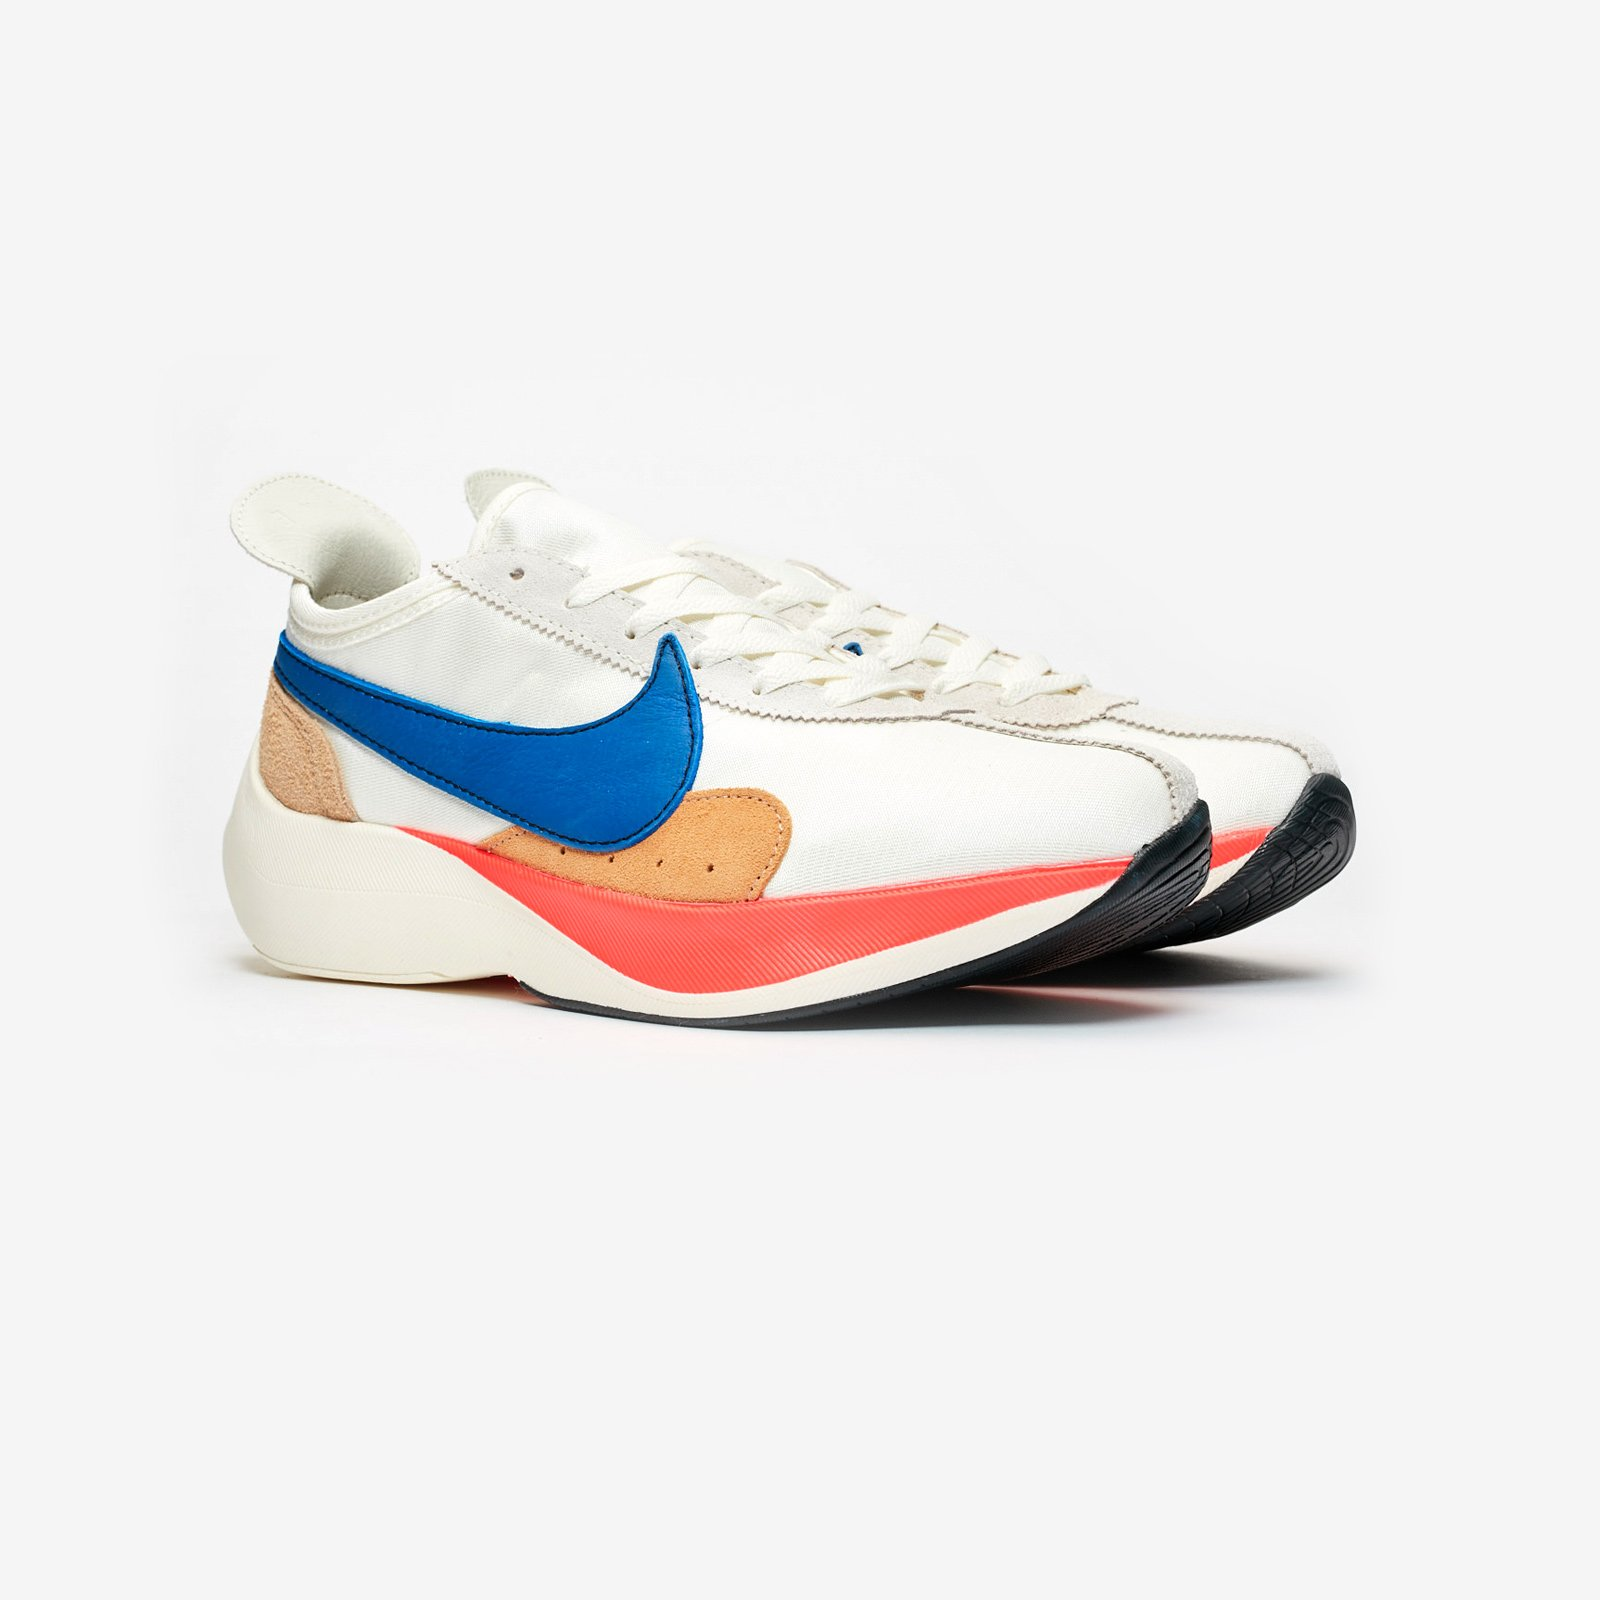 Nike Moon Racer Qs Bv7779 100 Sneakersnstuff Sneakers Streetwear Online Since 1999